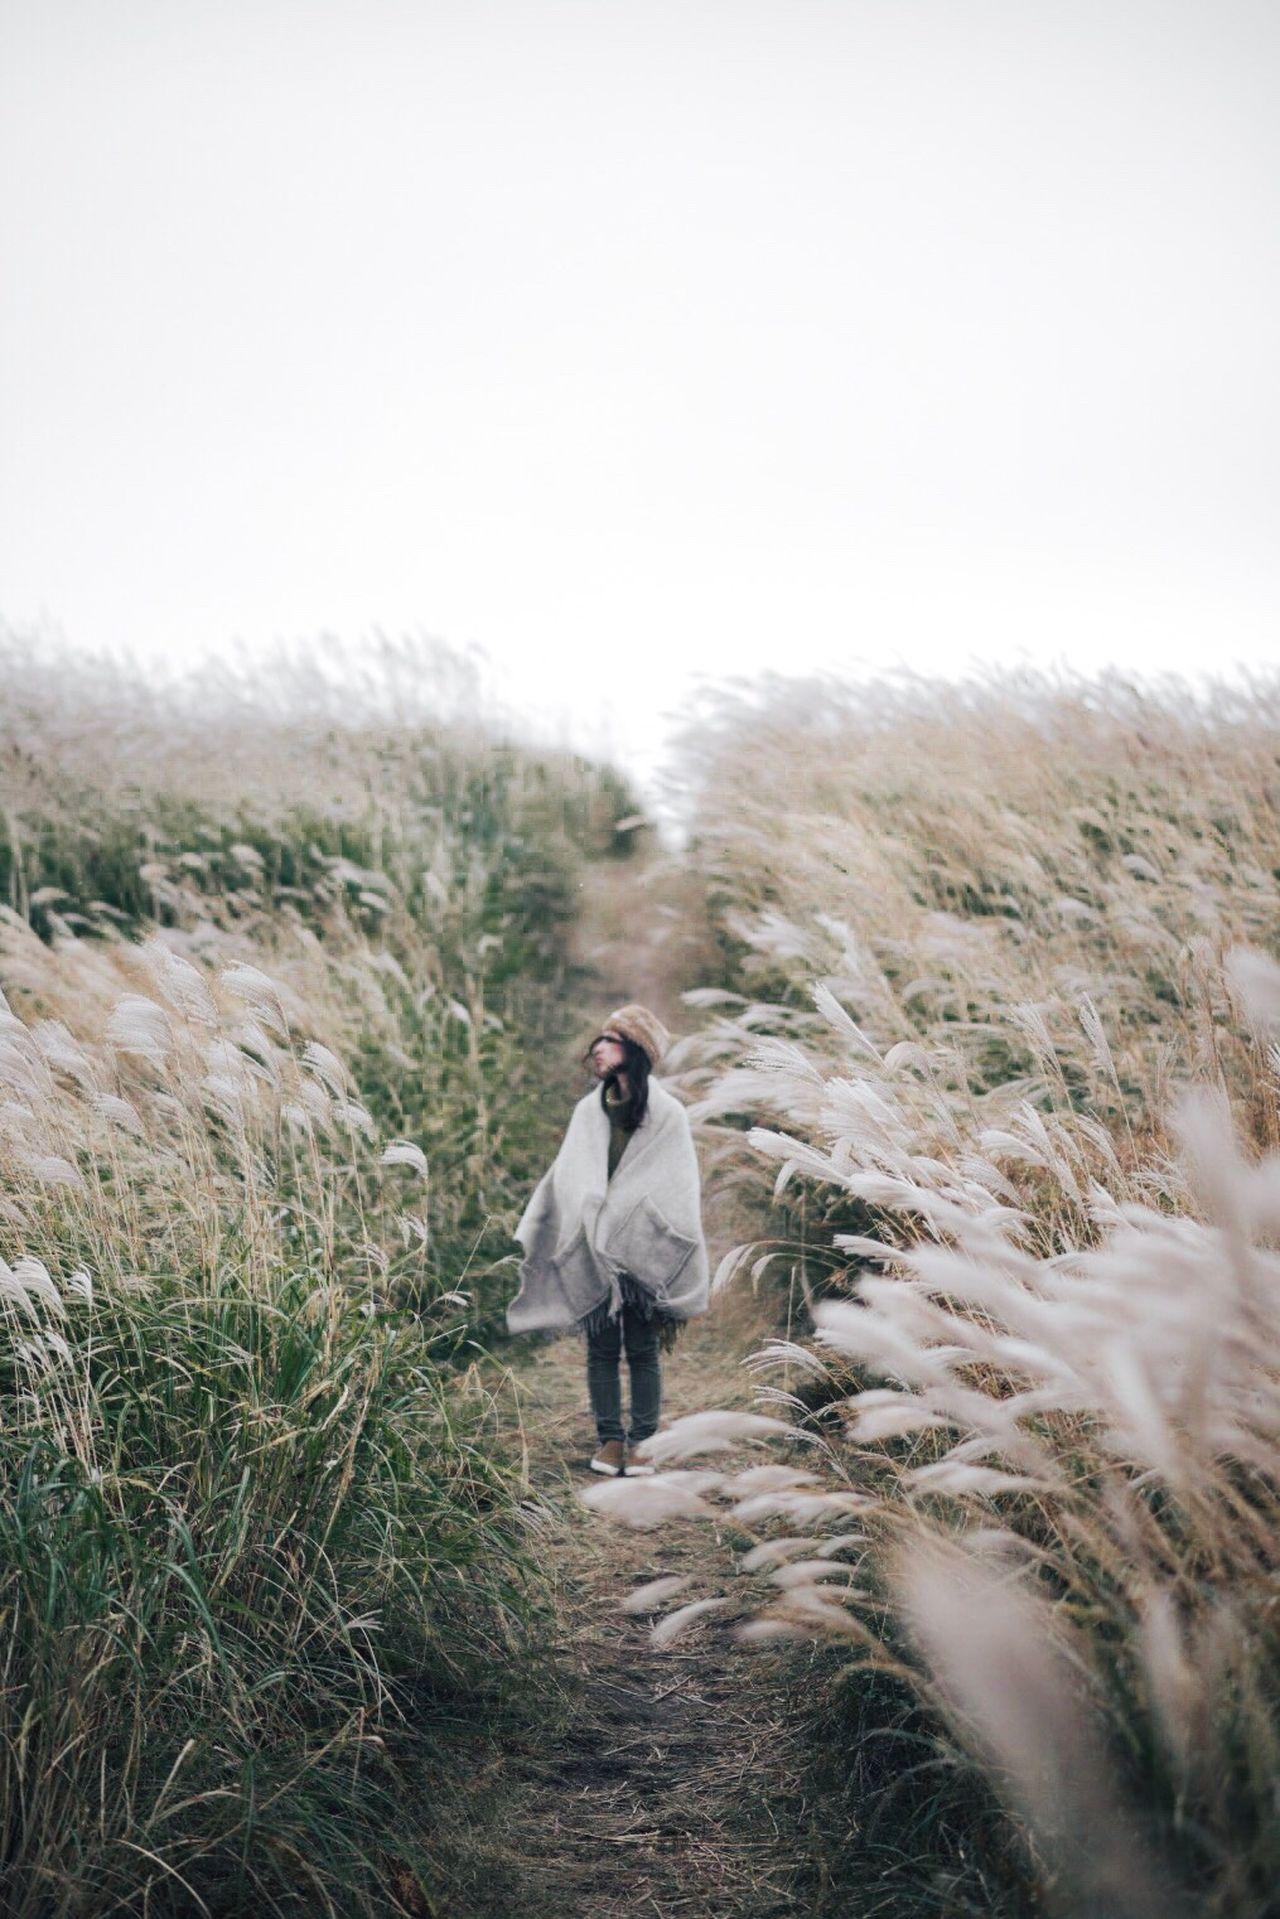 FULL LENGTH OF A WOMAN WALKING ON LANDSCAPE